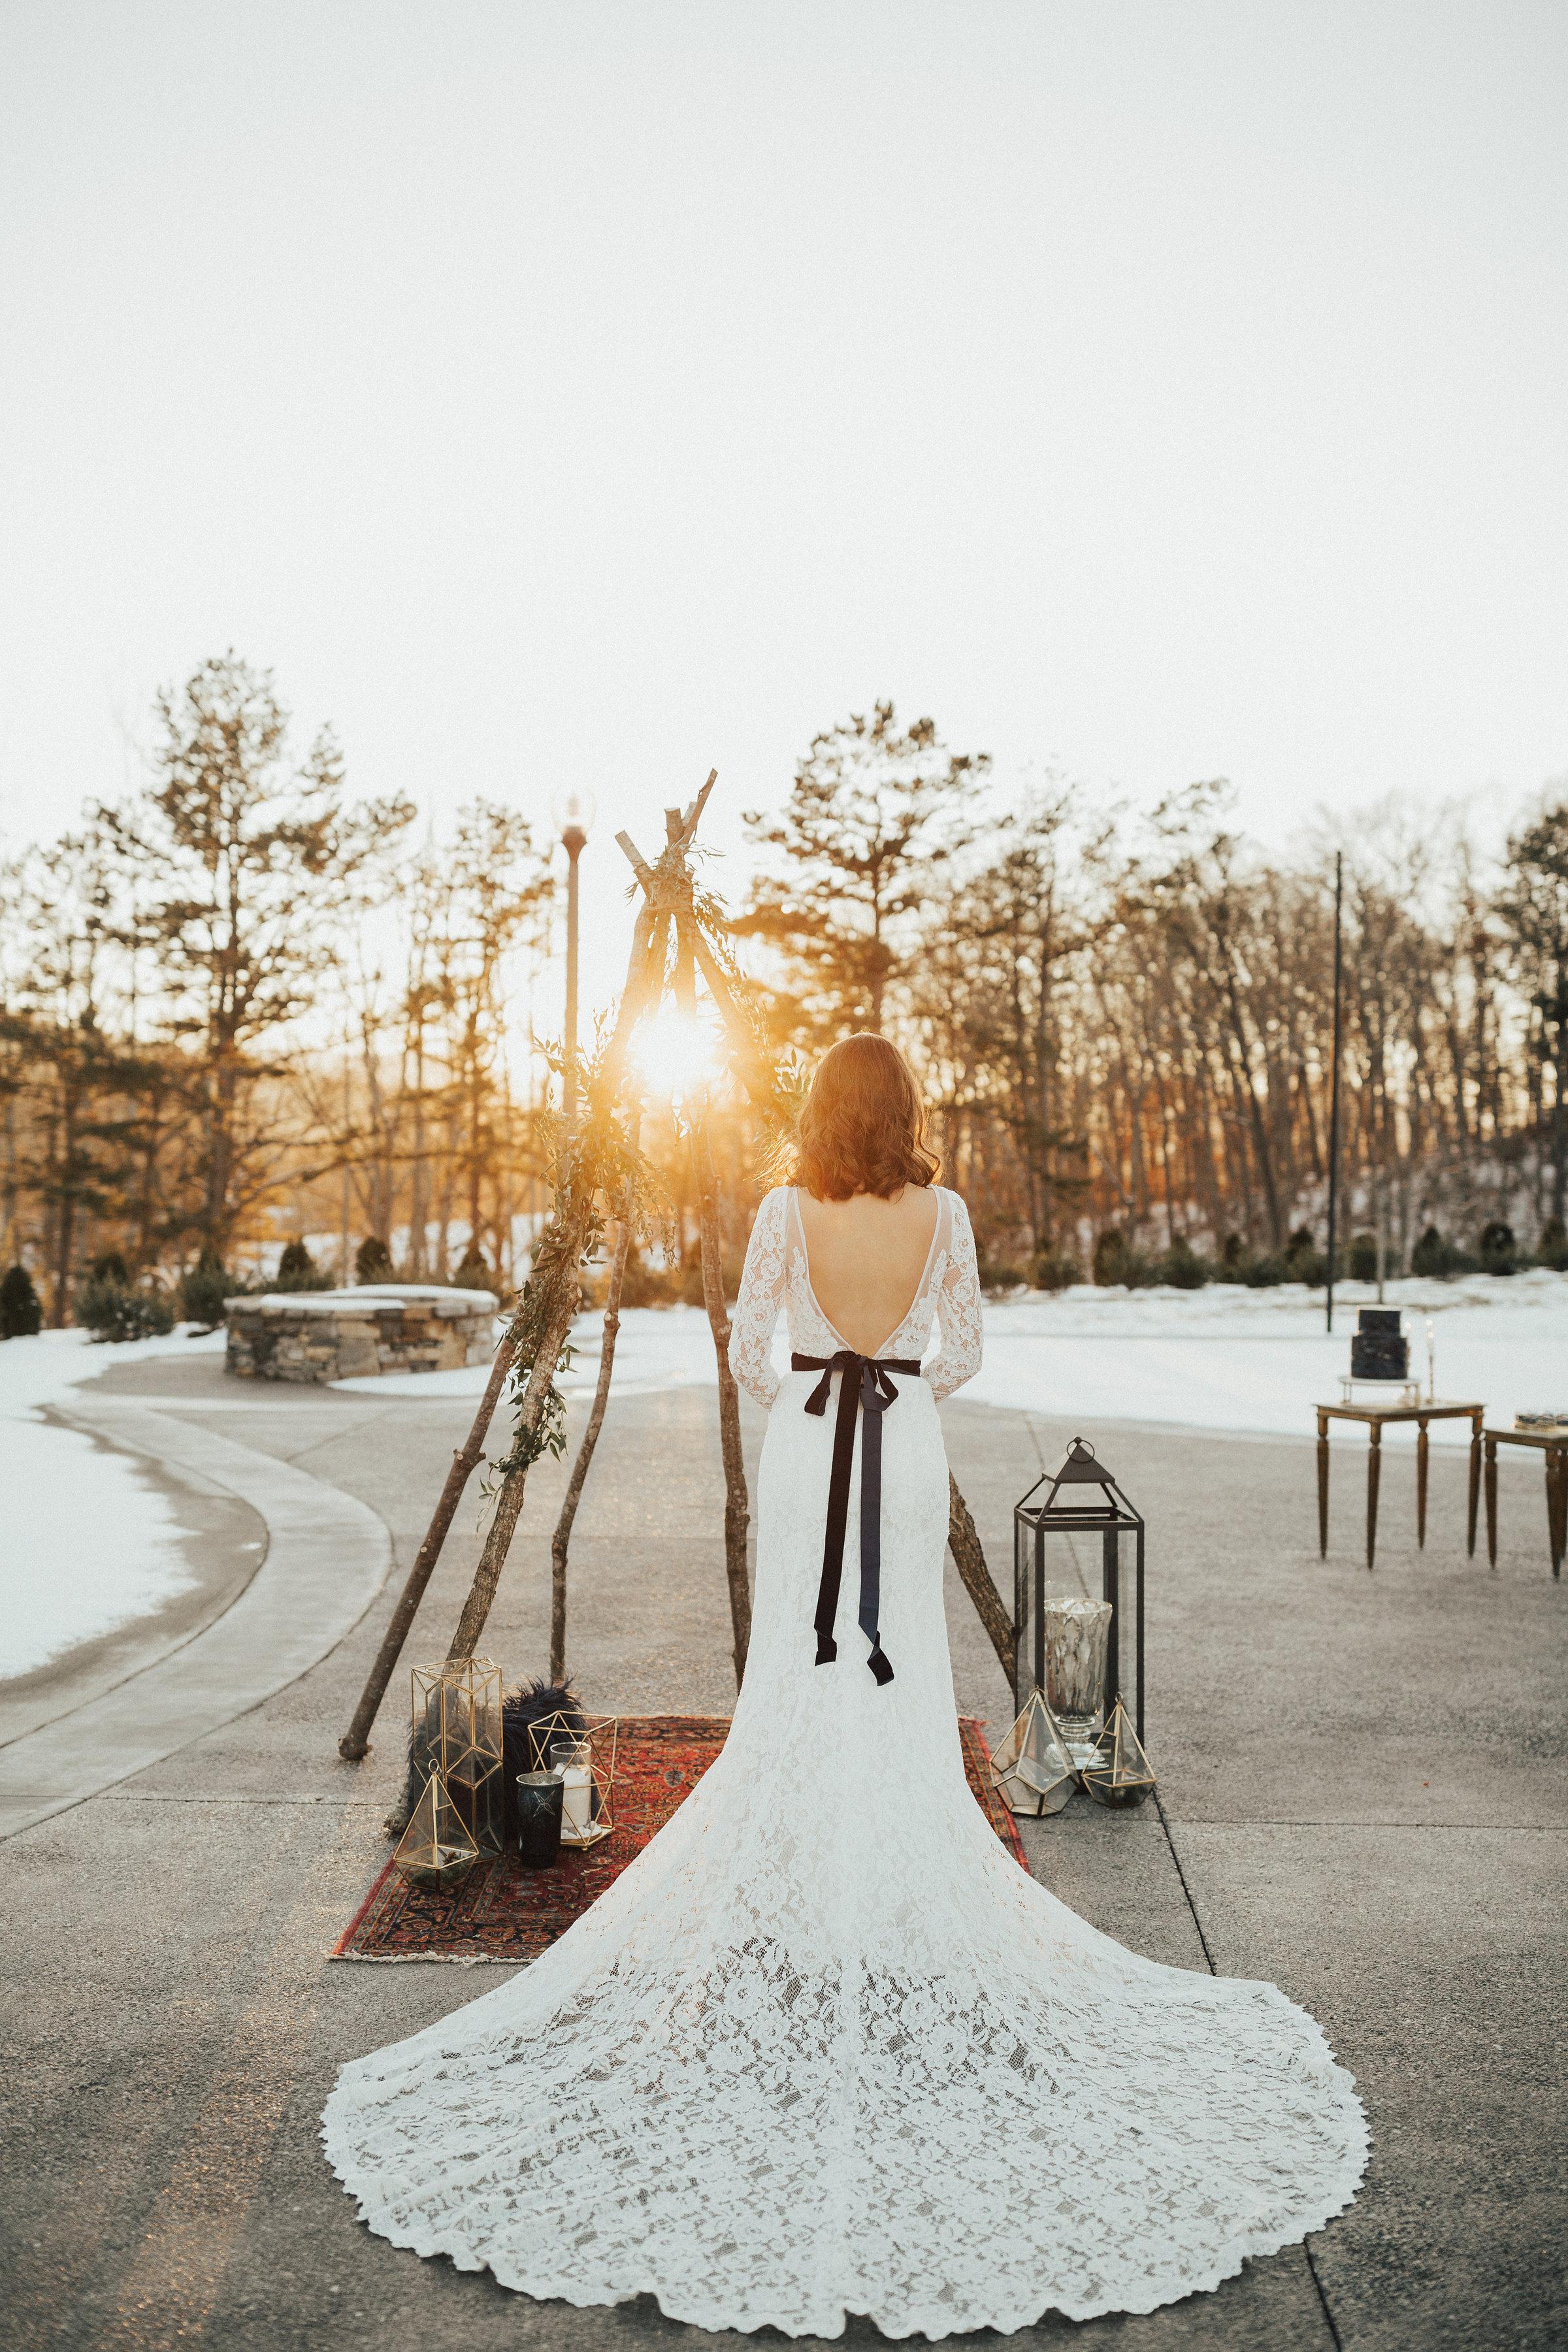 Joy-Unscripted-Wedding-Styled-Shoot-Celestial-Winter-90.jpg